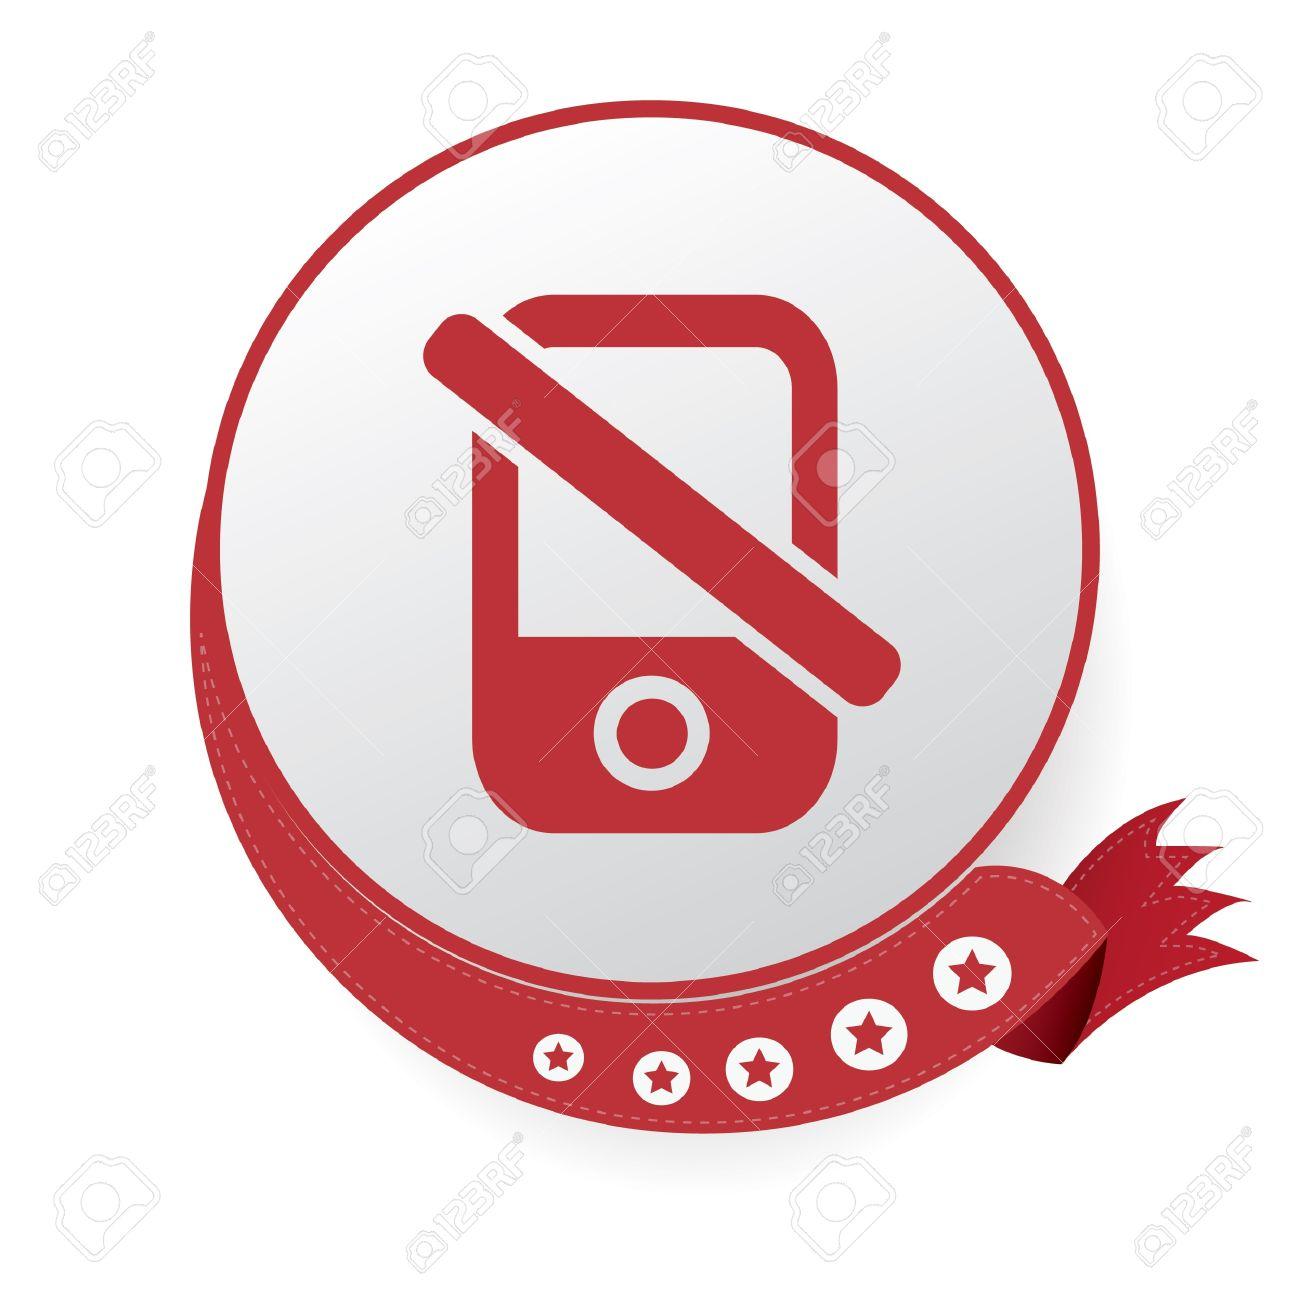 No Cell Phone Symbol Royalty Free Cliparts Vectors And Stock